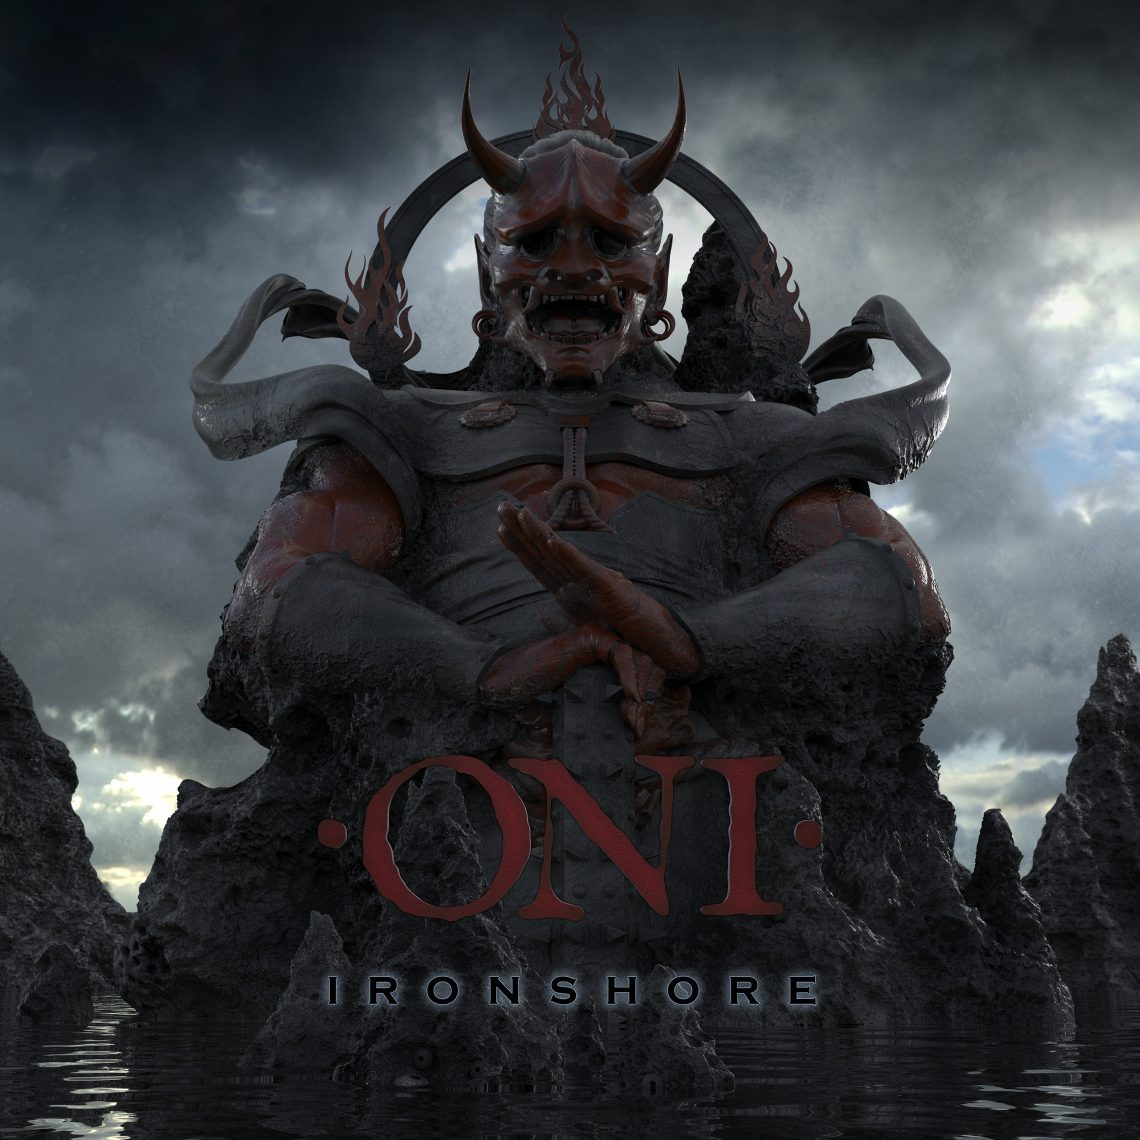 Oni – Ironshore Album Review